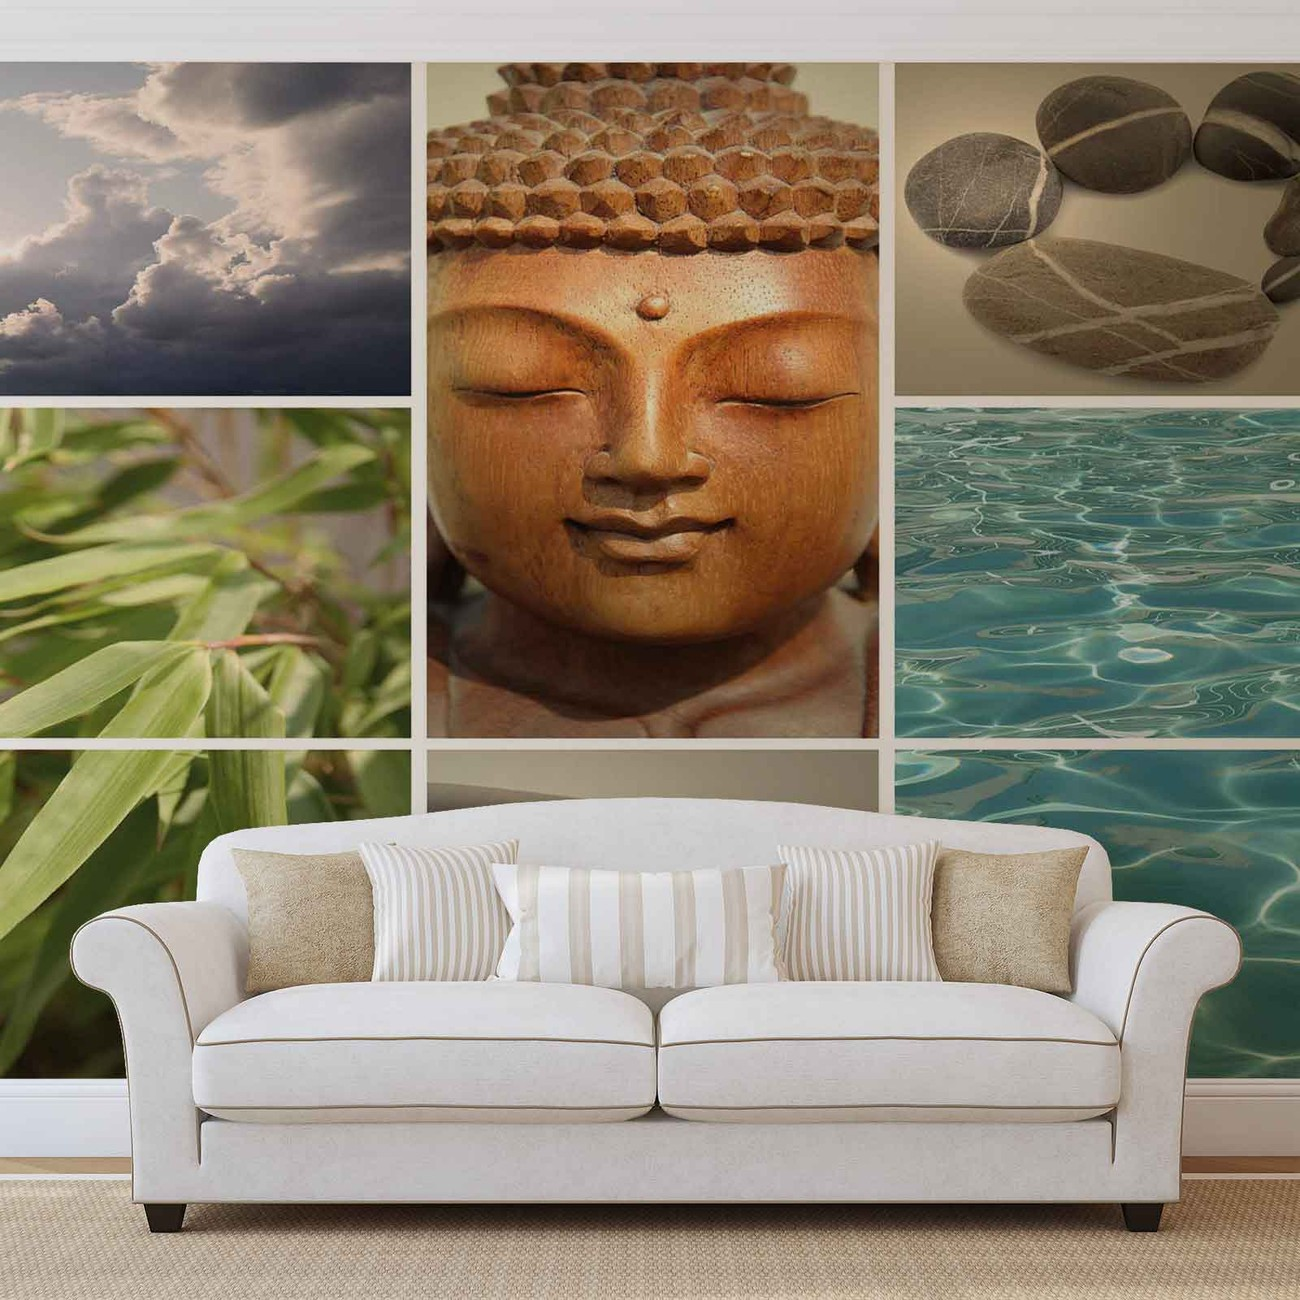 Sc ne relaxante zen poster mural papier peint acheter for Poster xxl mural zen